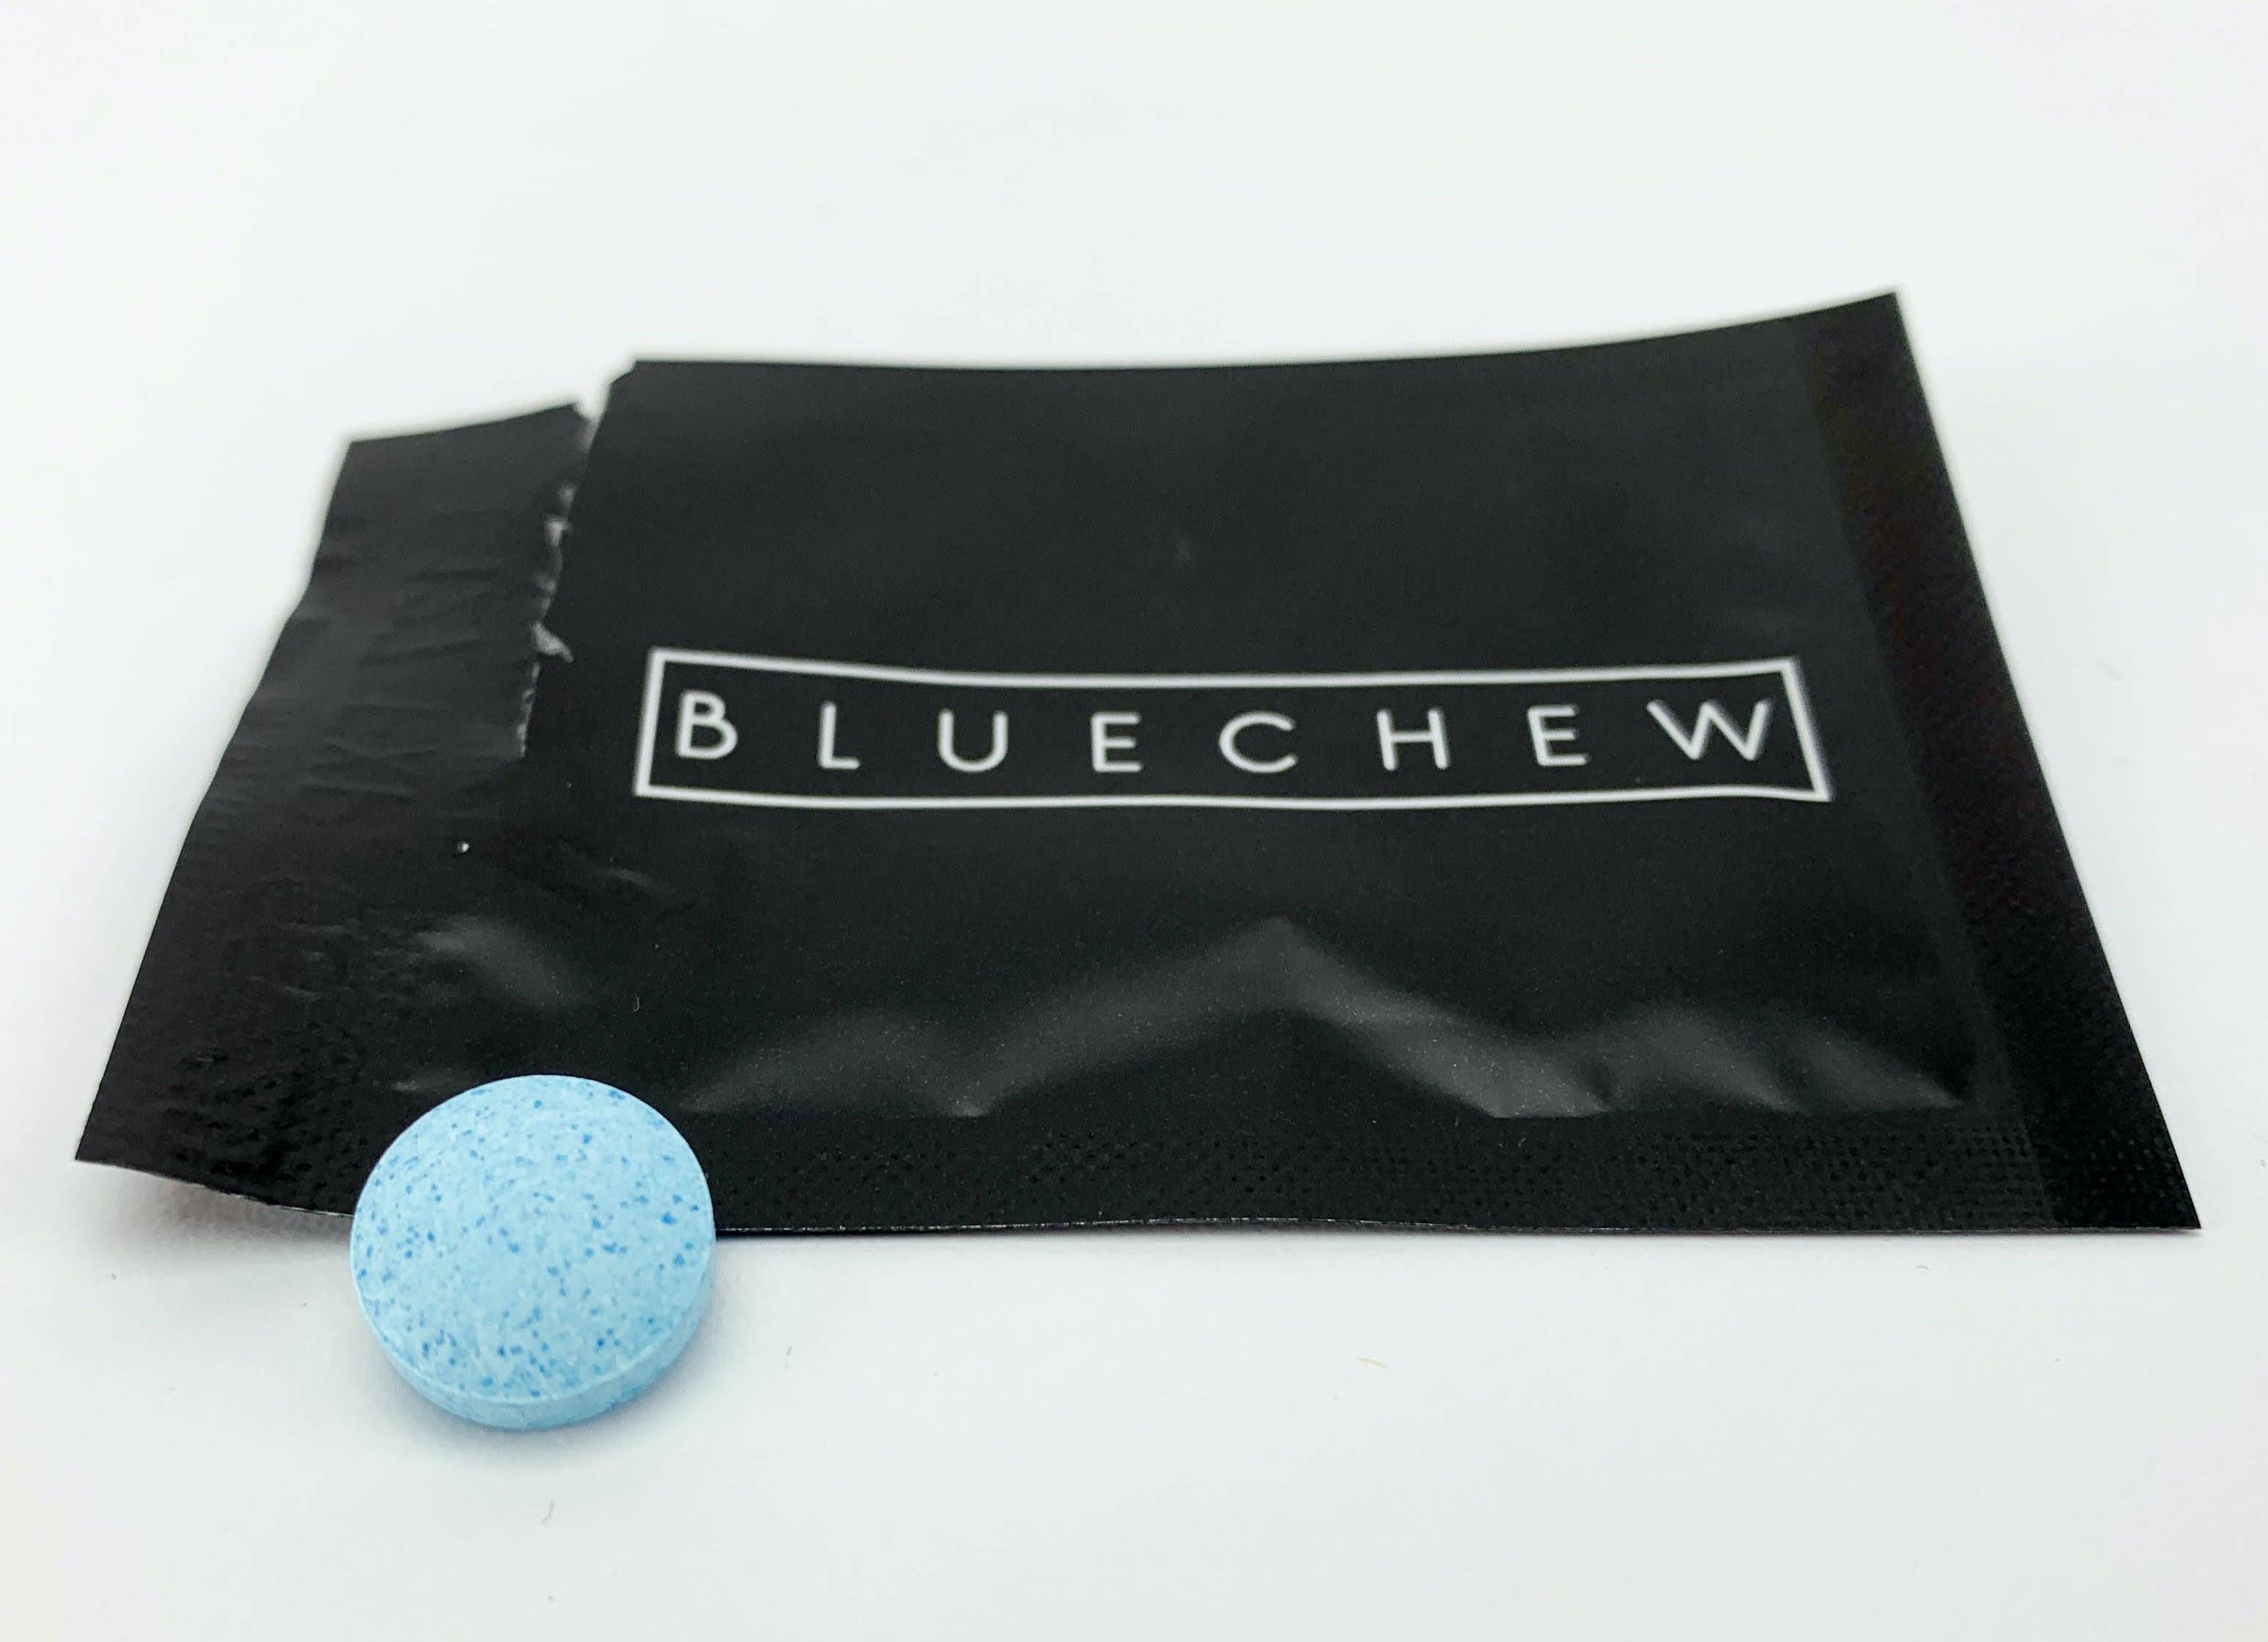 Is BlueChew Legitimate?